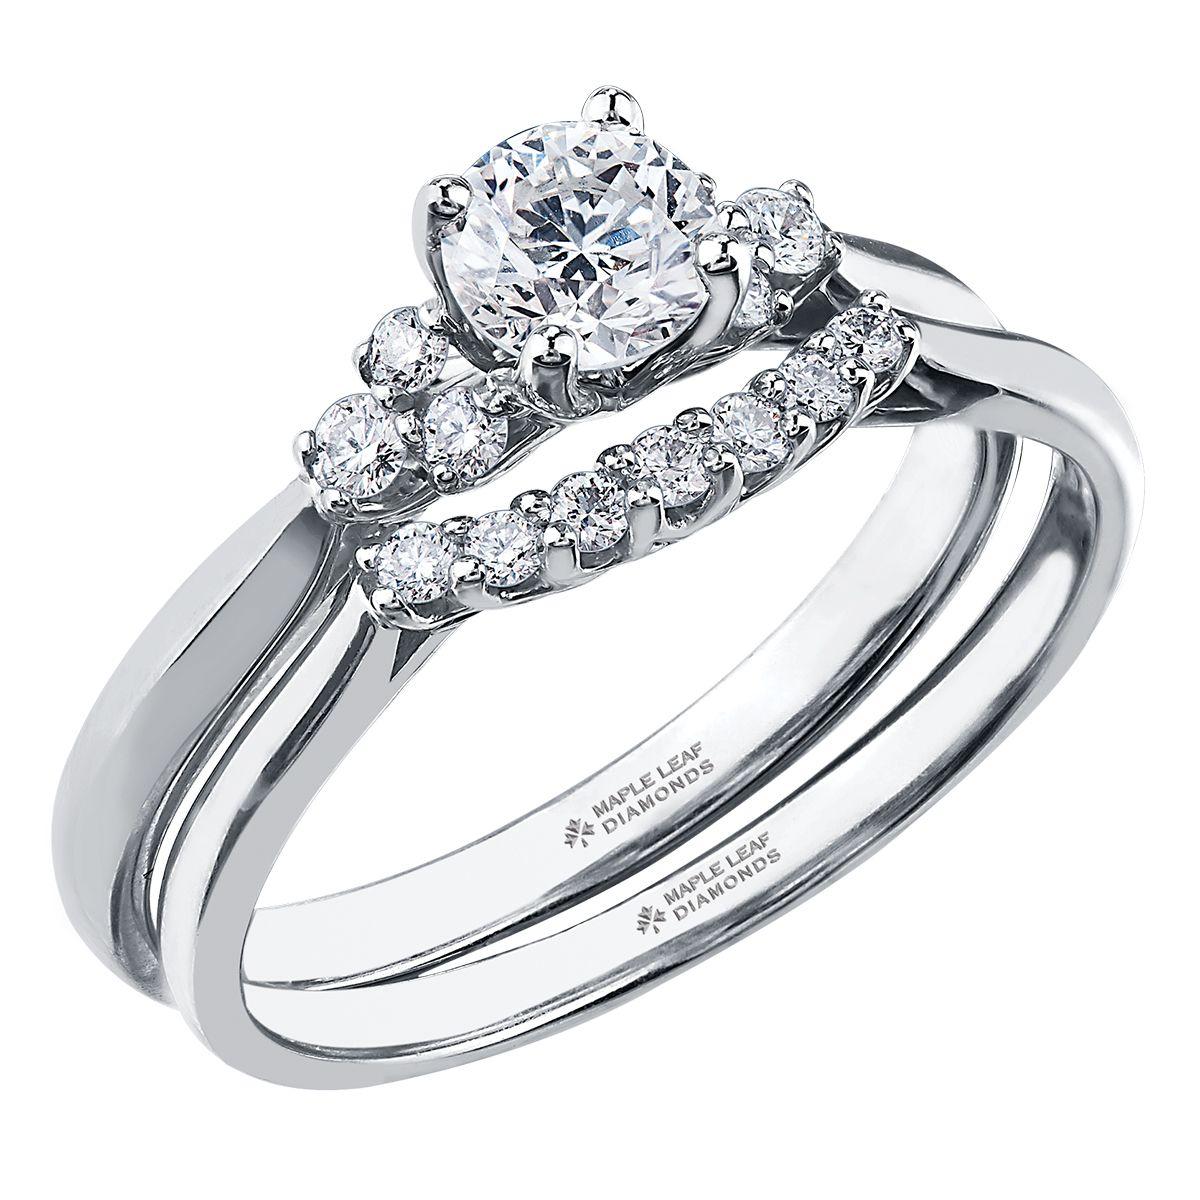 Diamond Accent Engagement and Diamond Ring. 7 Stone